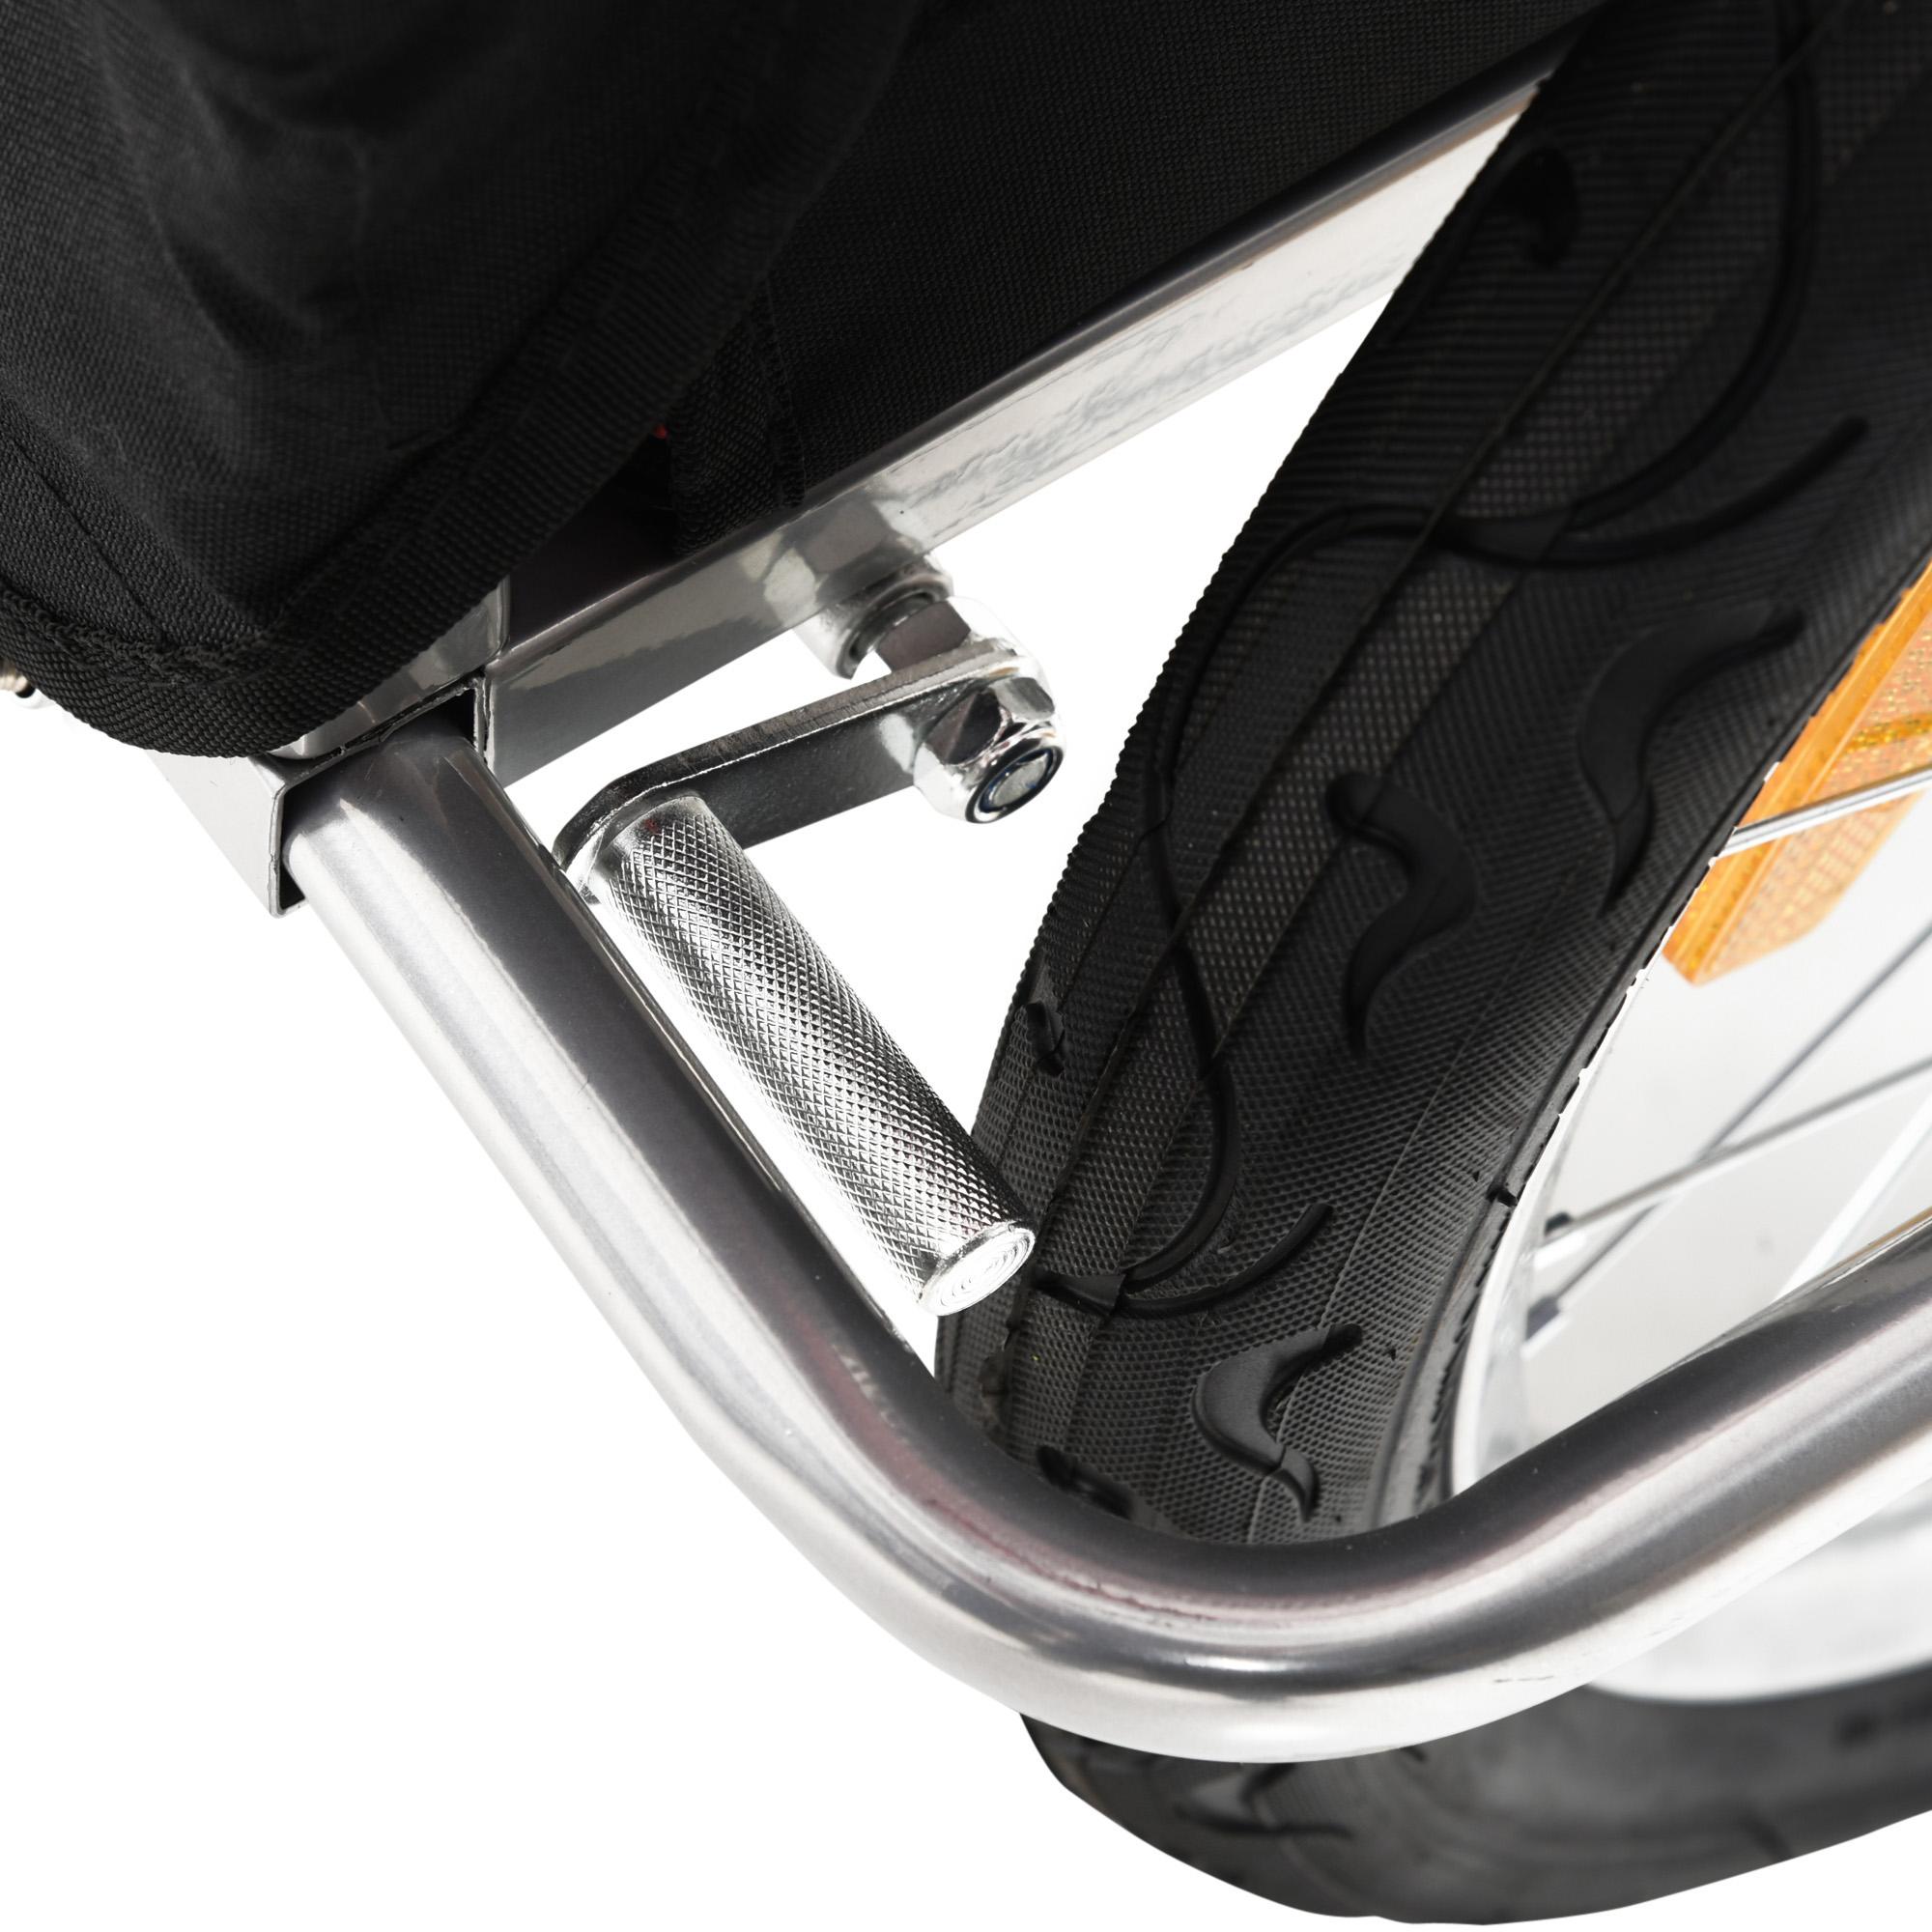 miniatura 44 - Remolque Bicicleta Niño 2 PLAZAS+Amortiguador Kit Footing Freno Bandera Cubierta